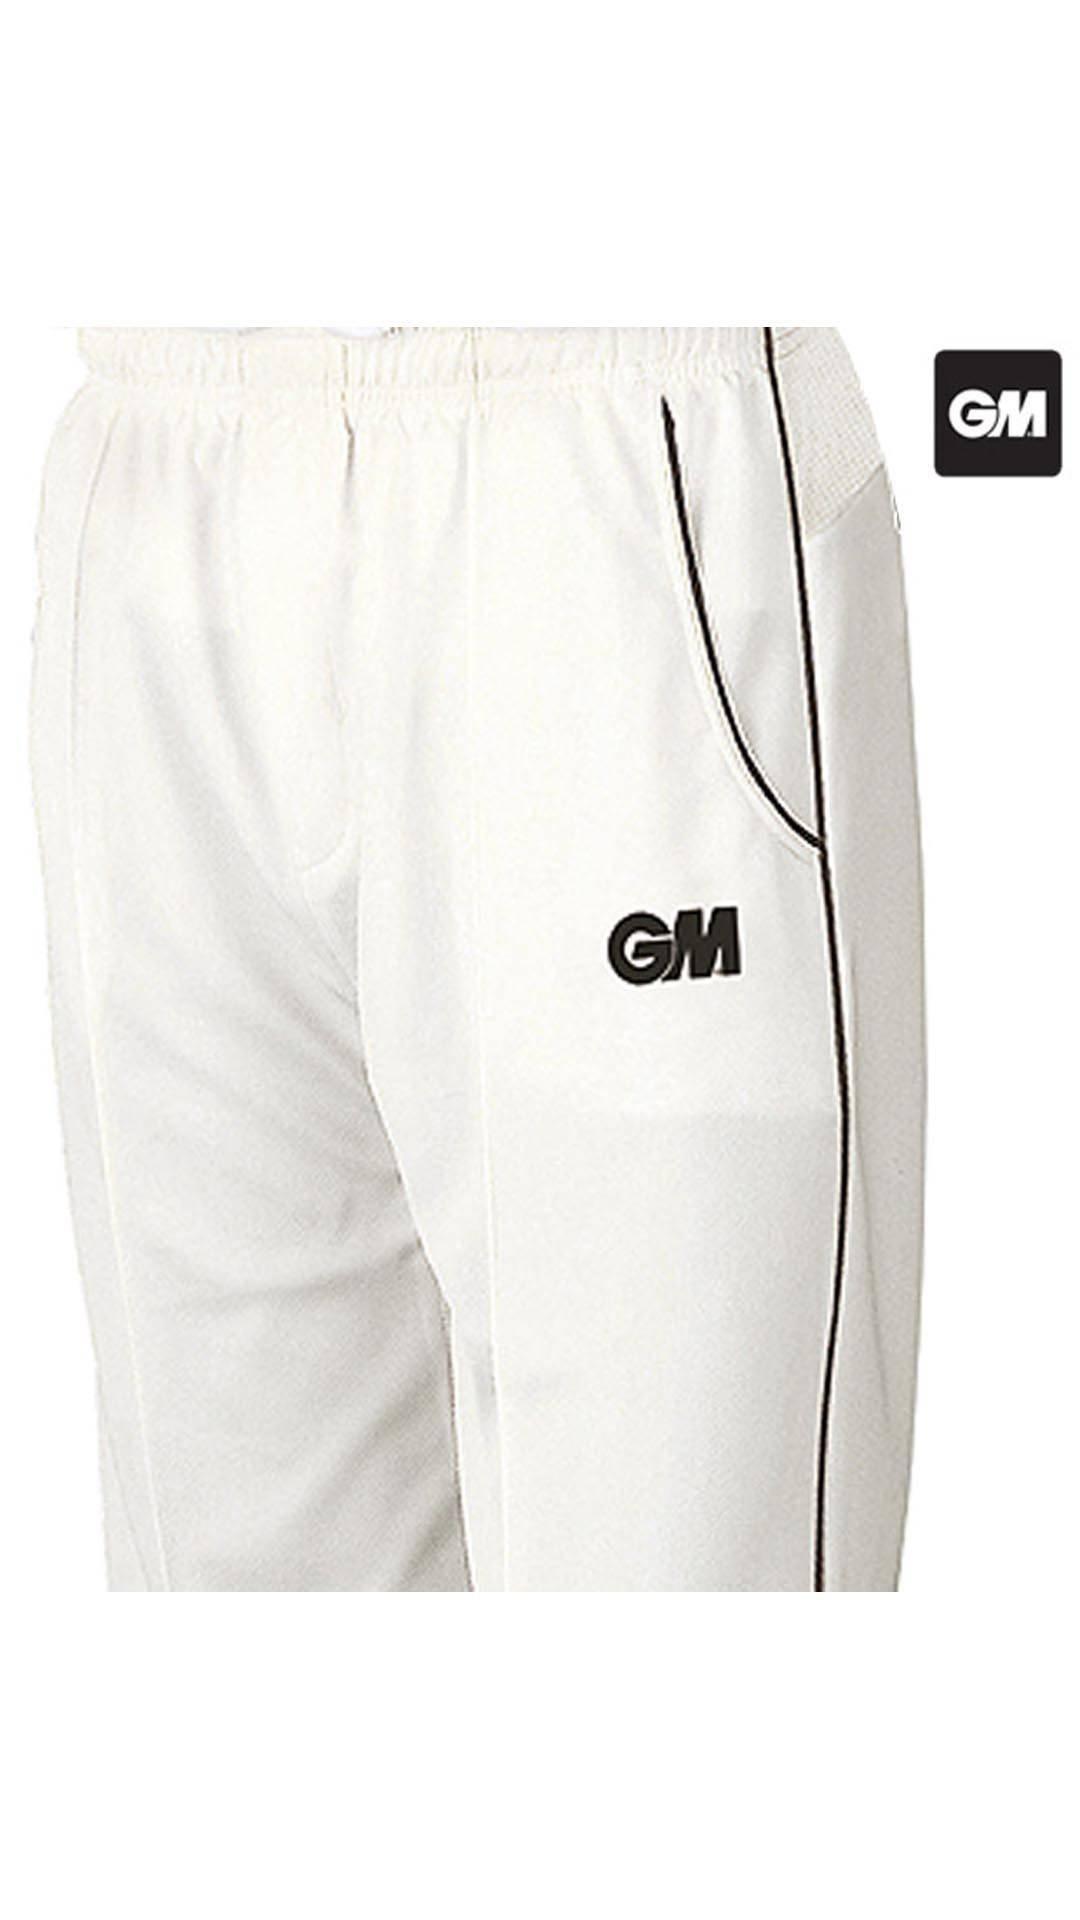 GM 7130 Cricket Trouser